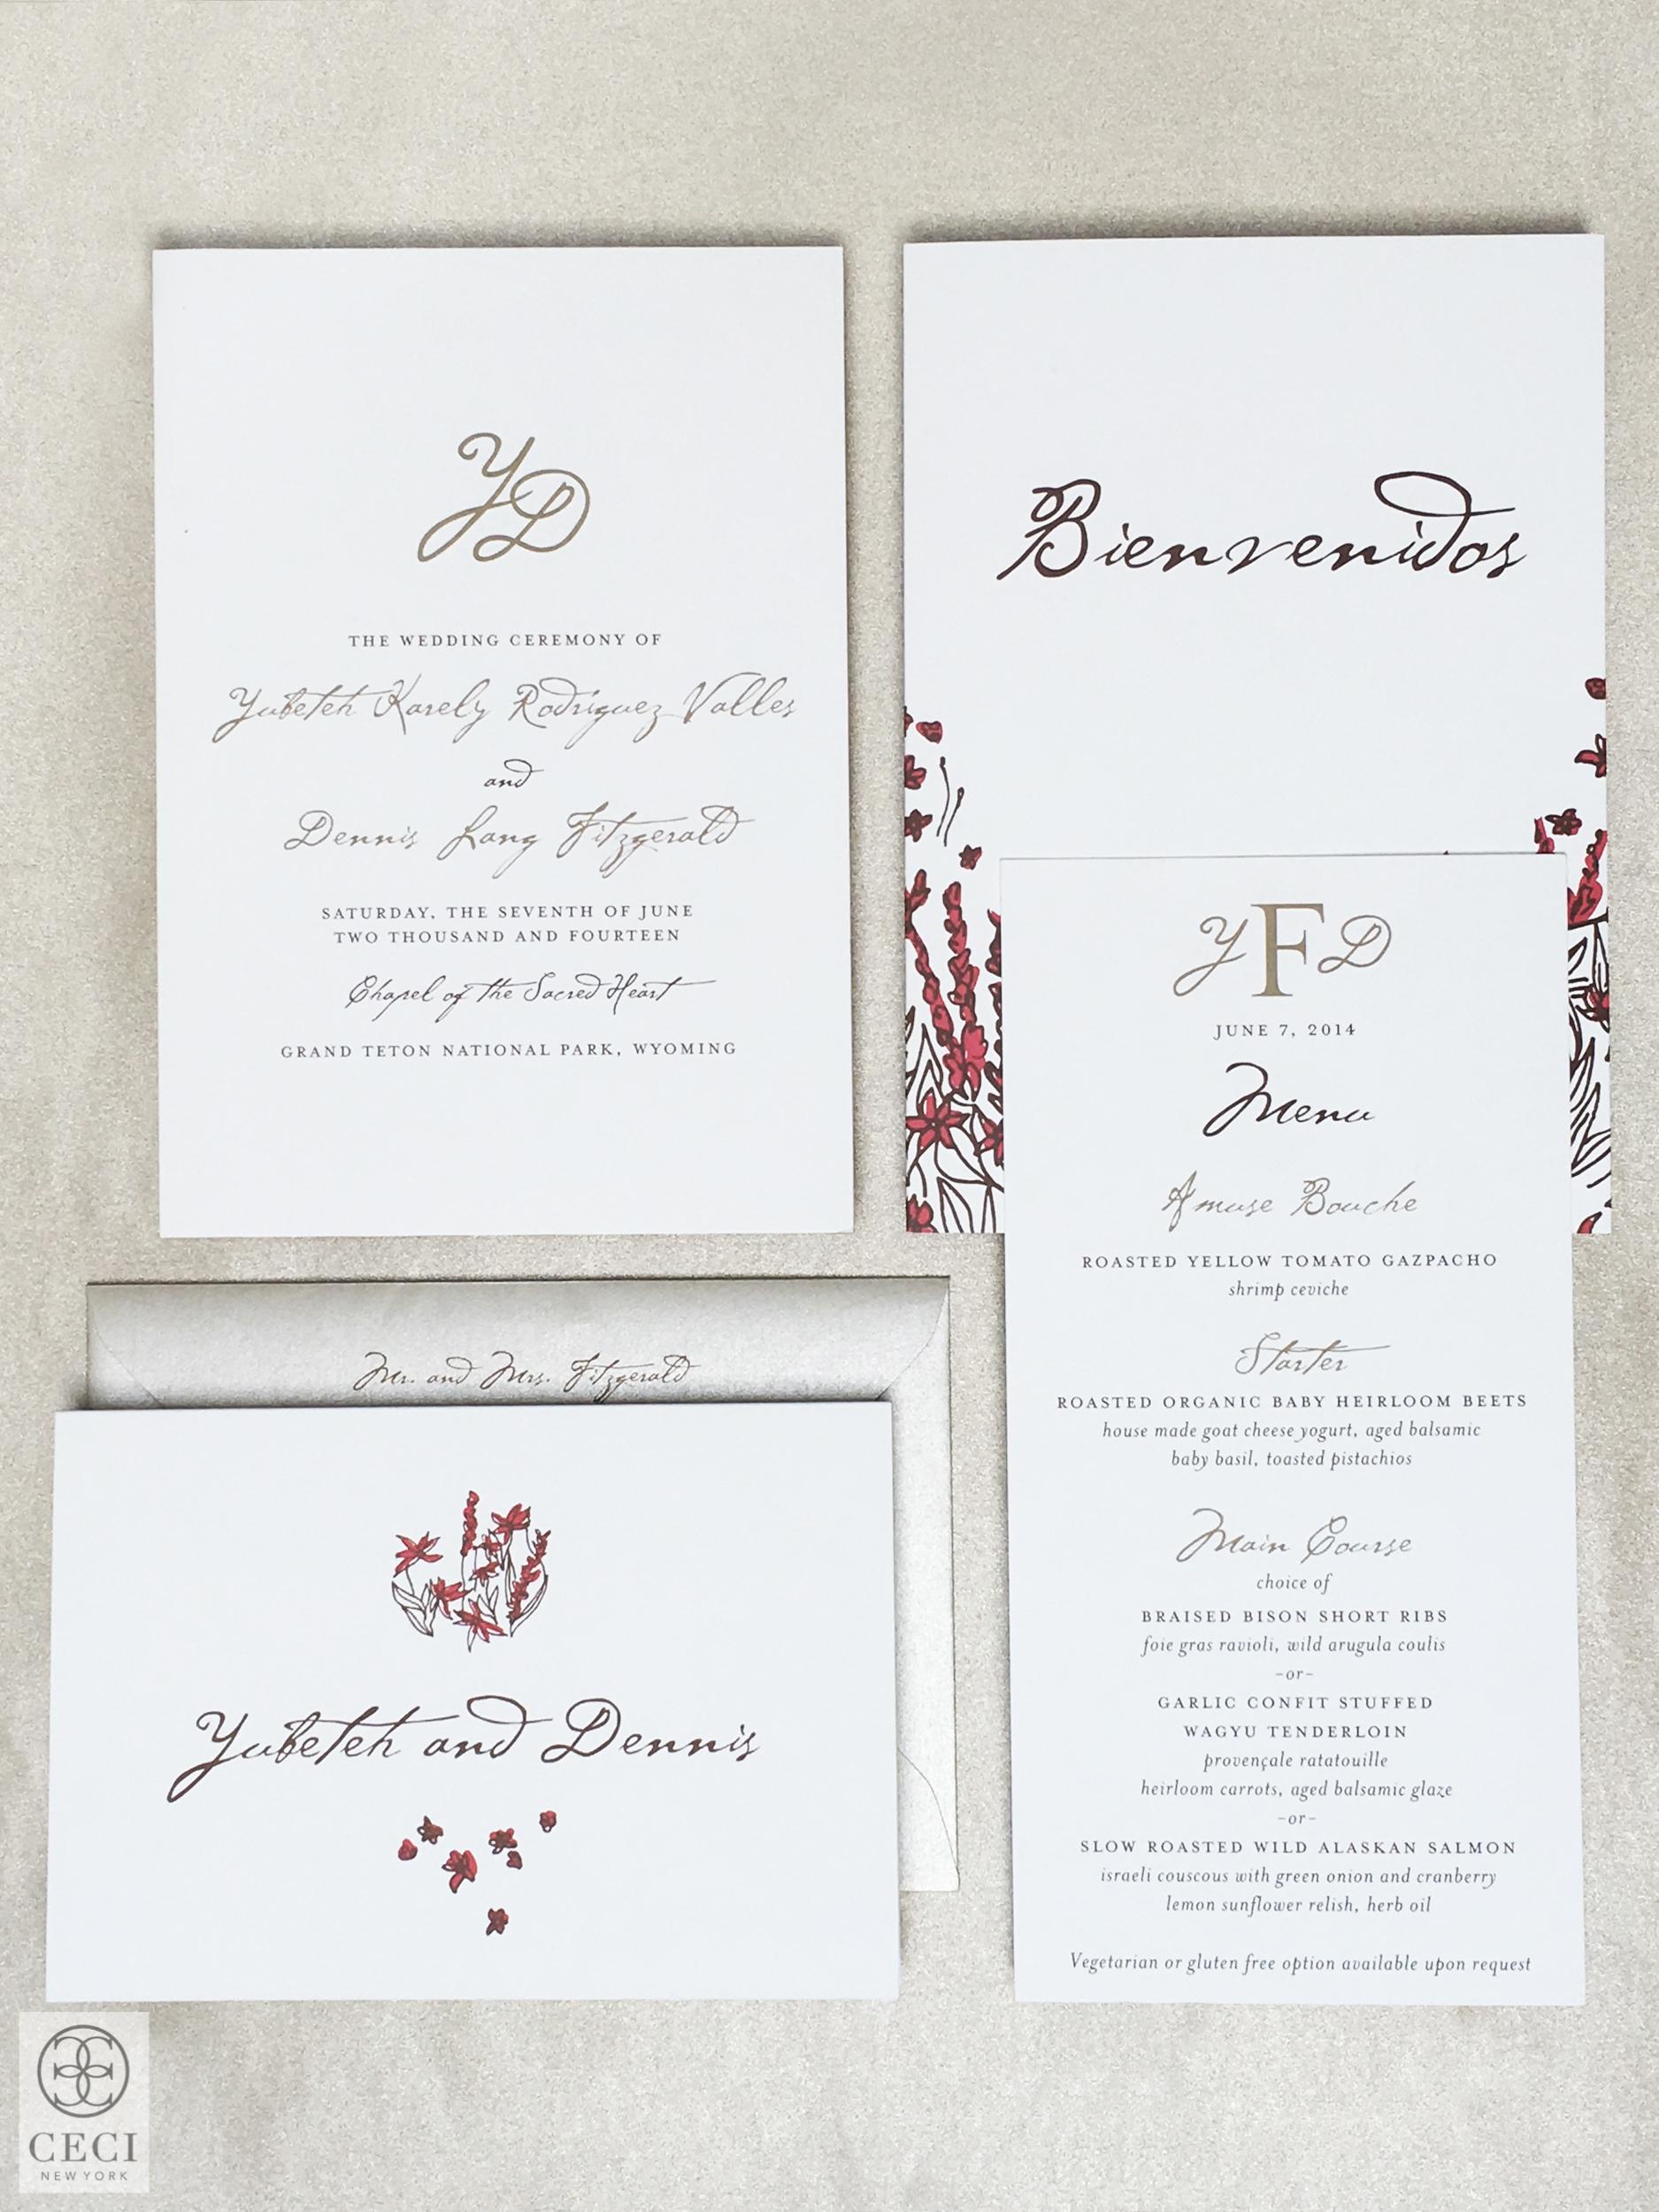 Ceci_New_York_Lyndsey_Hamilton_Events_Invitations_Wedding_Amangani_Elegance_Gold_Foil_Letterpress_Classic_Stamping_Custom_Couture_Personalized-14.jpg